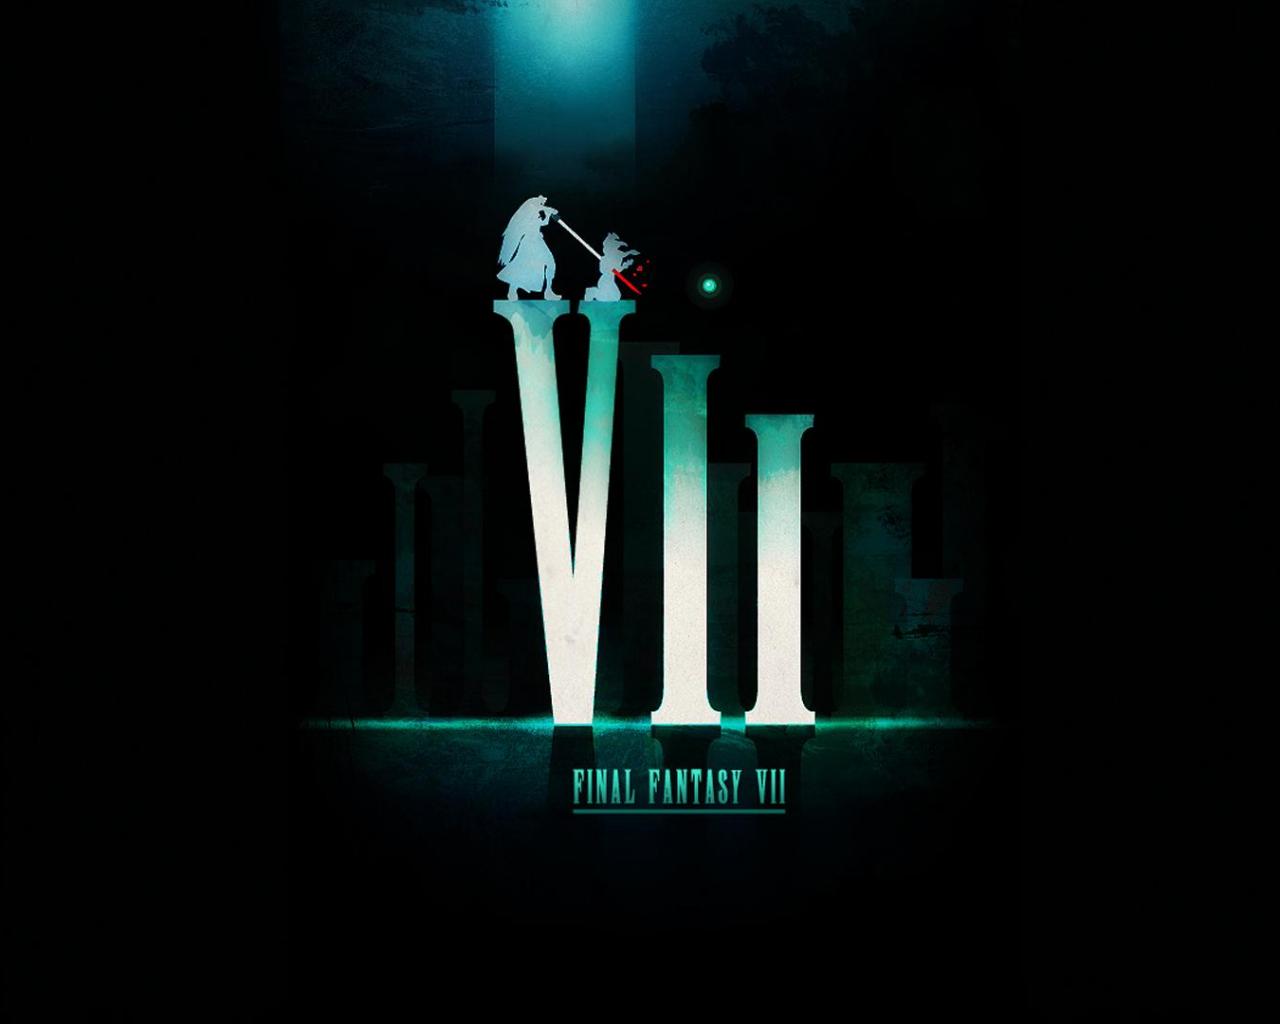 Free Download Vii Game Final Fantasy Movies Final Fantasy Vii